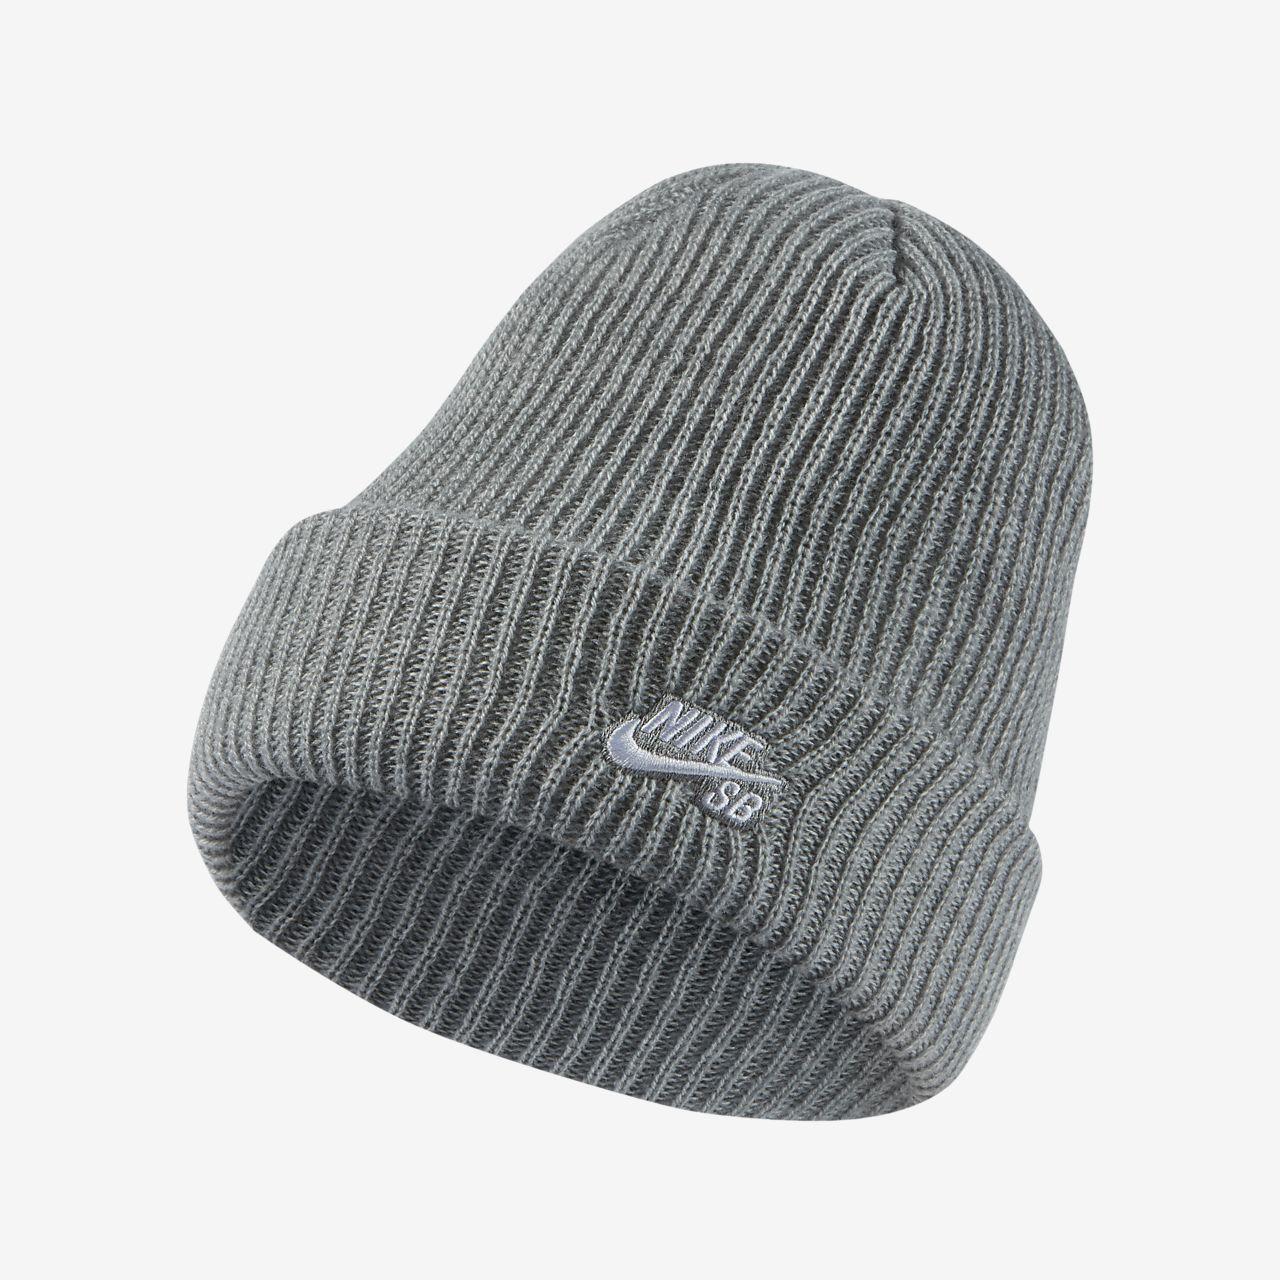 5f9f811fe0a Nike SB Fisherman Knit Hat. Nike.com AU